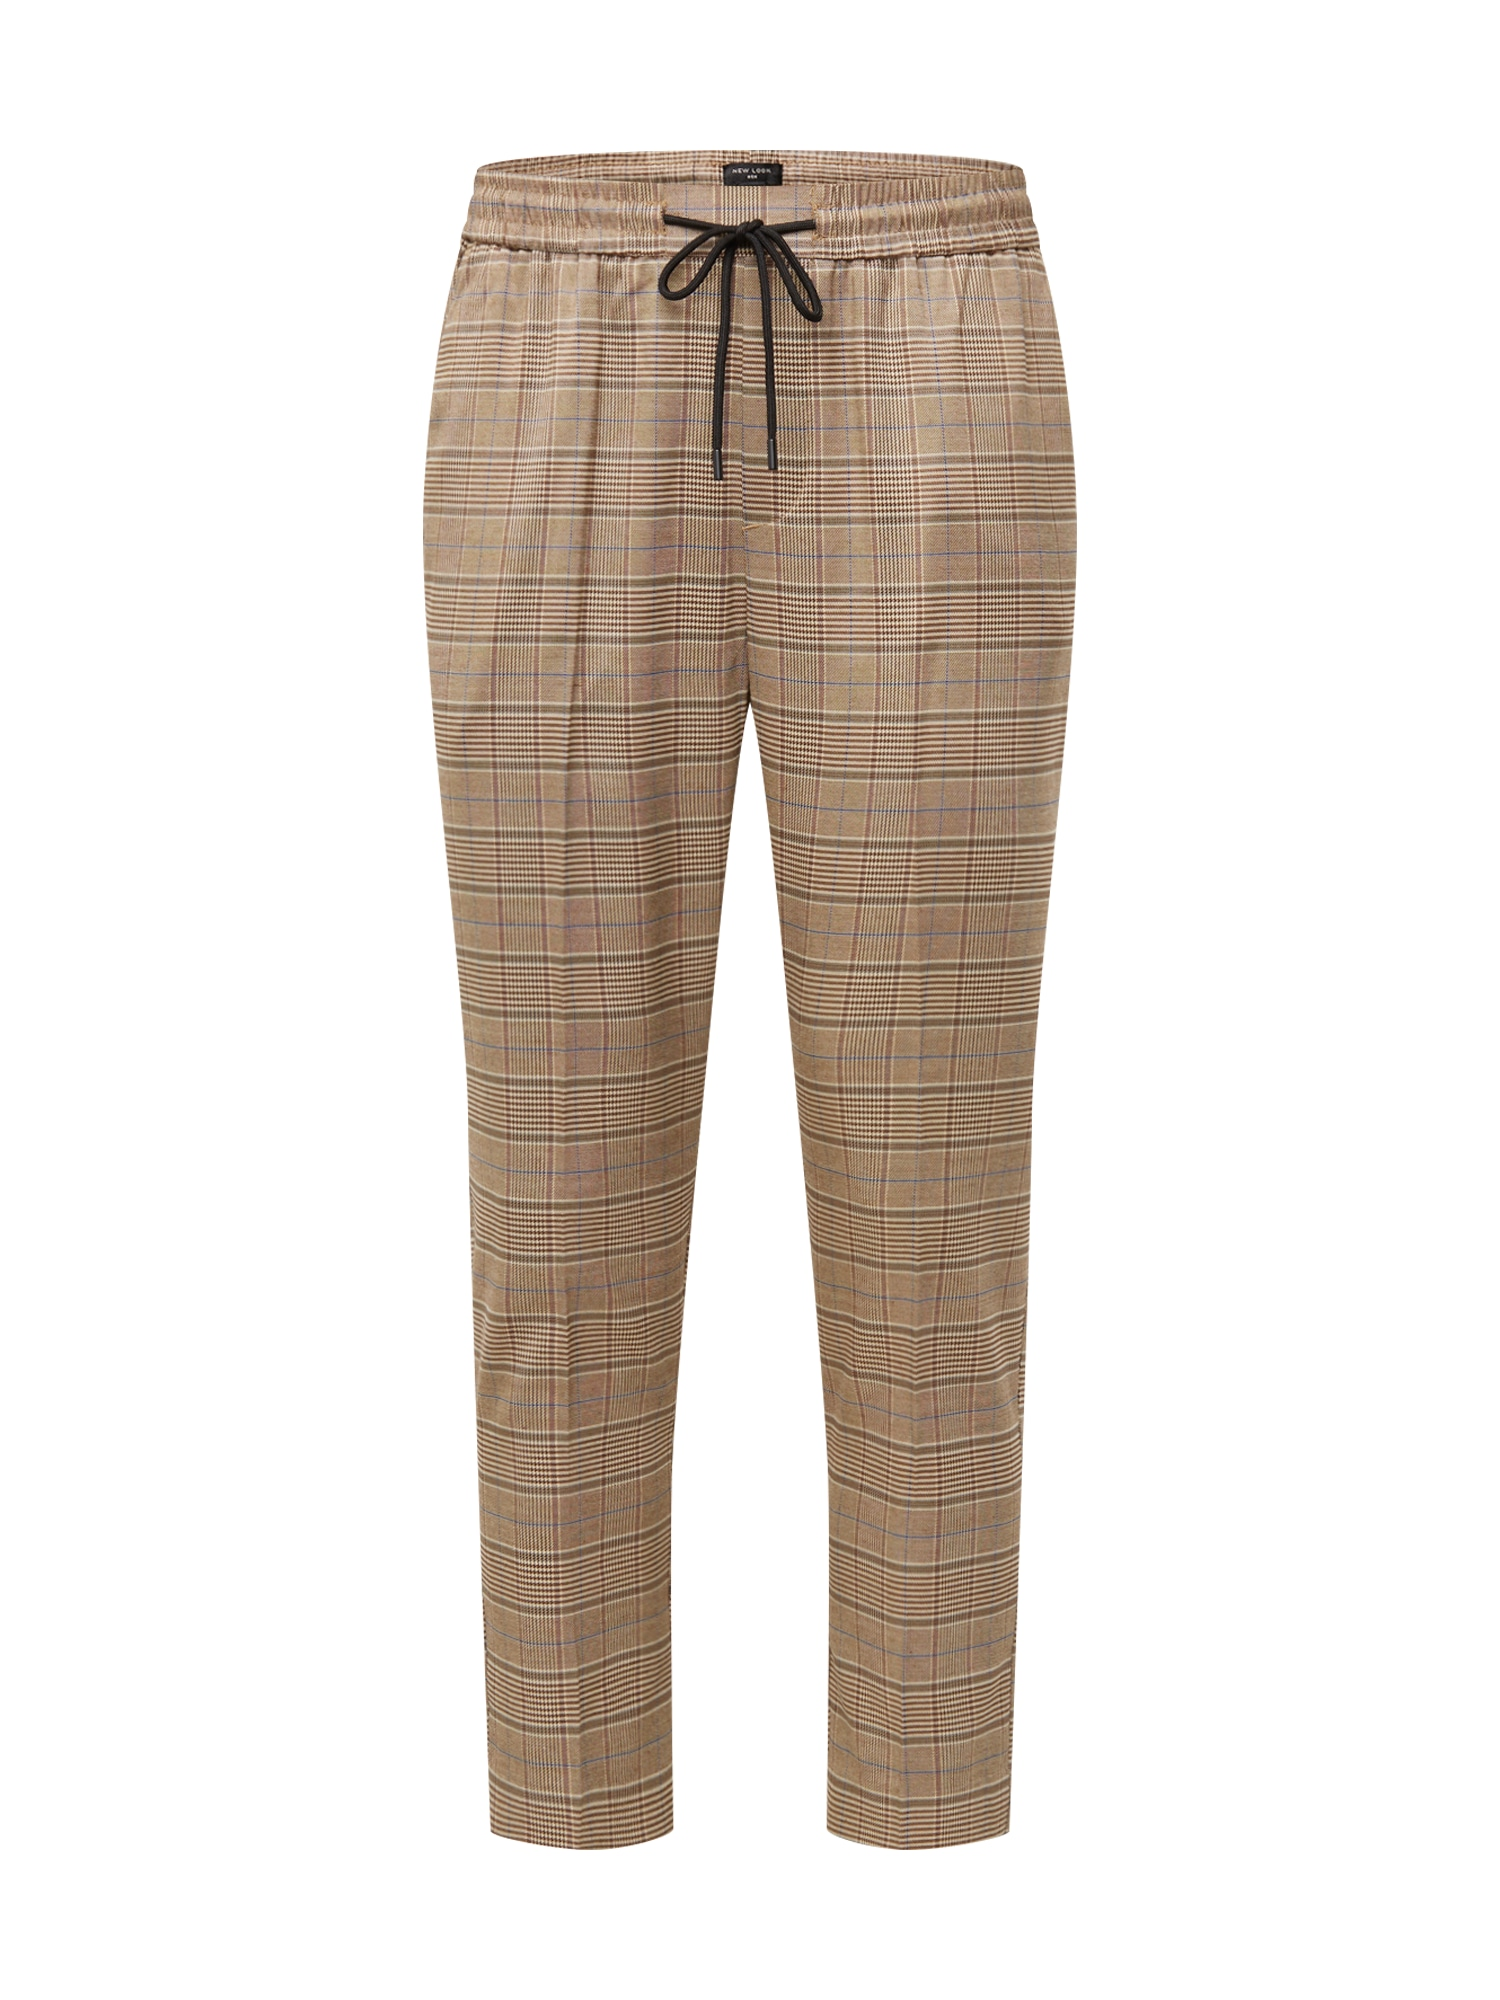 Kalhoty s puky RPFMA 19.10.18 BRUCE CHECK PULL ON hnědá NEW LOOK